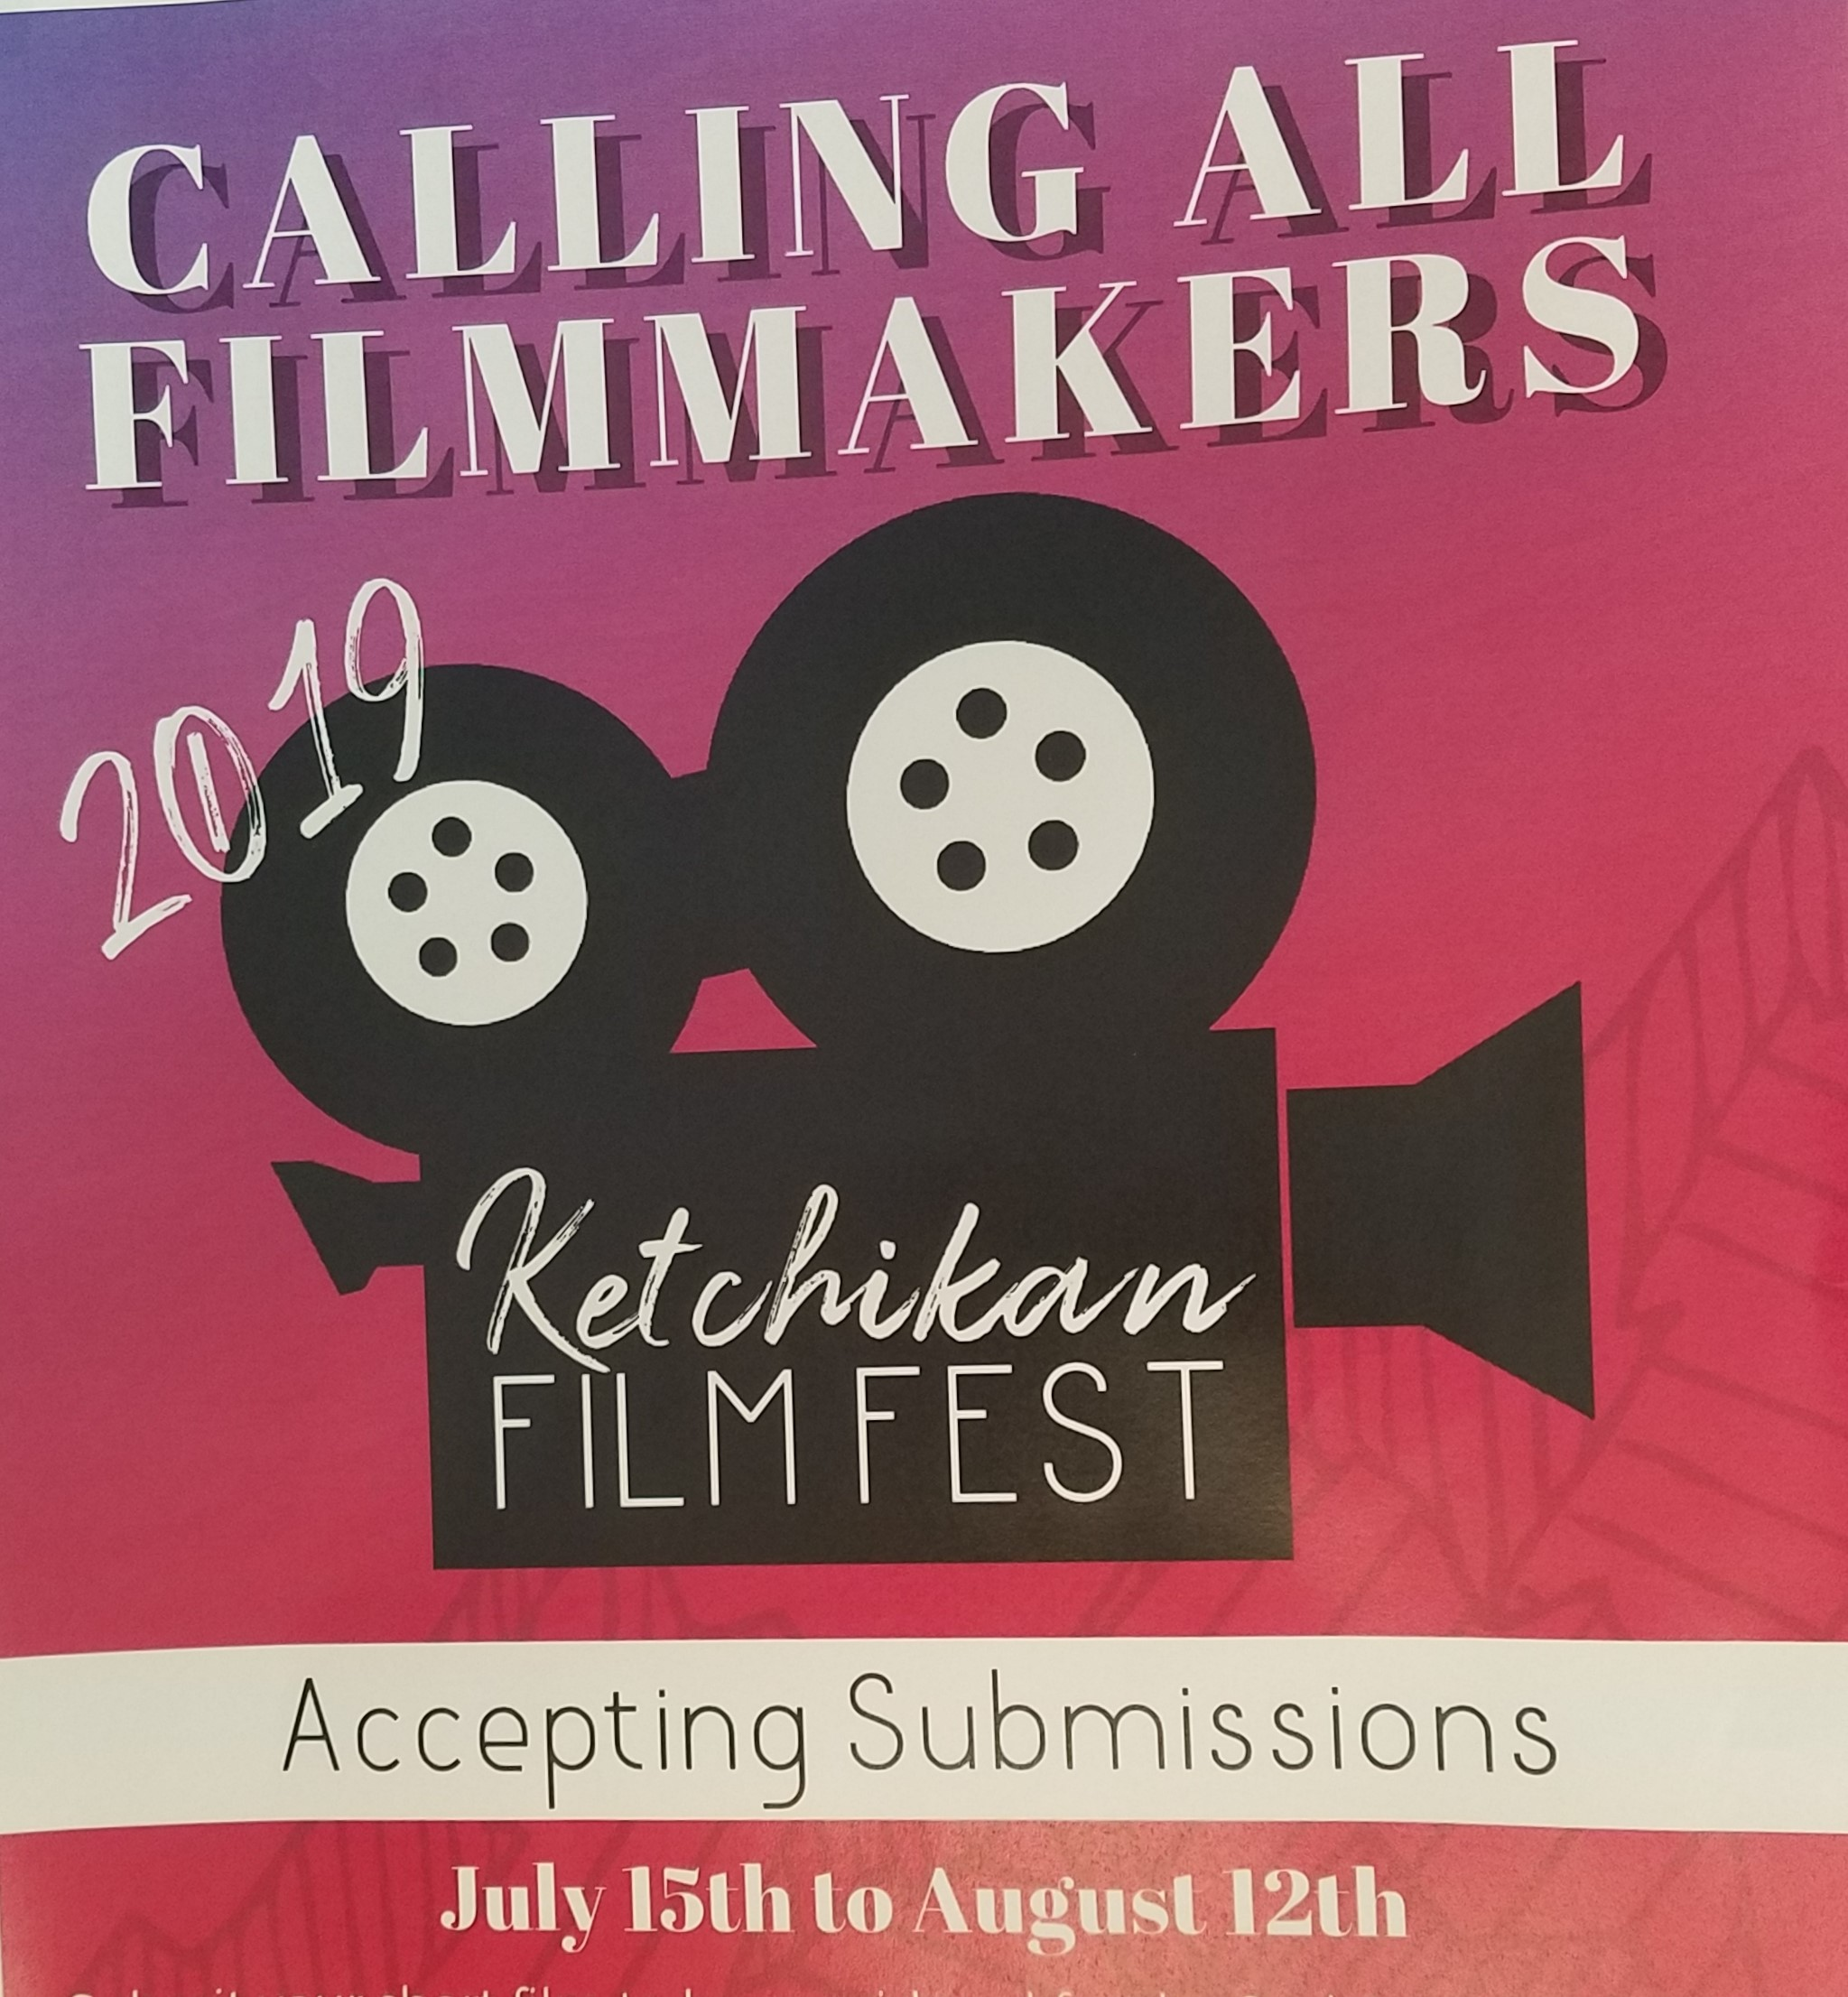 Ketchikan Film Fest